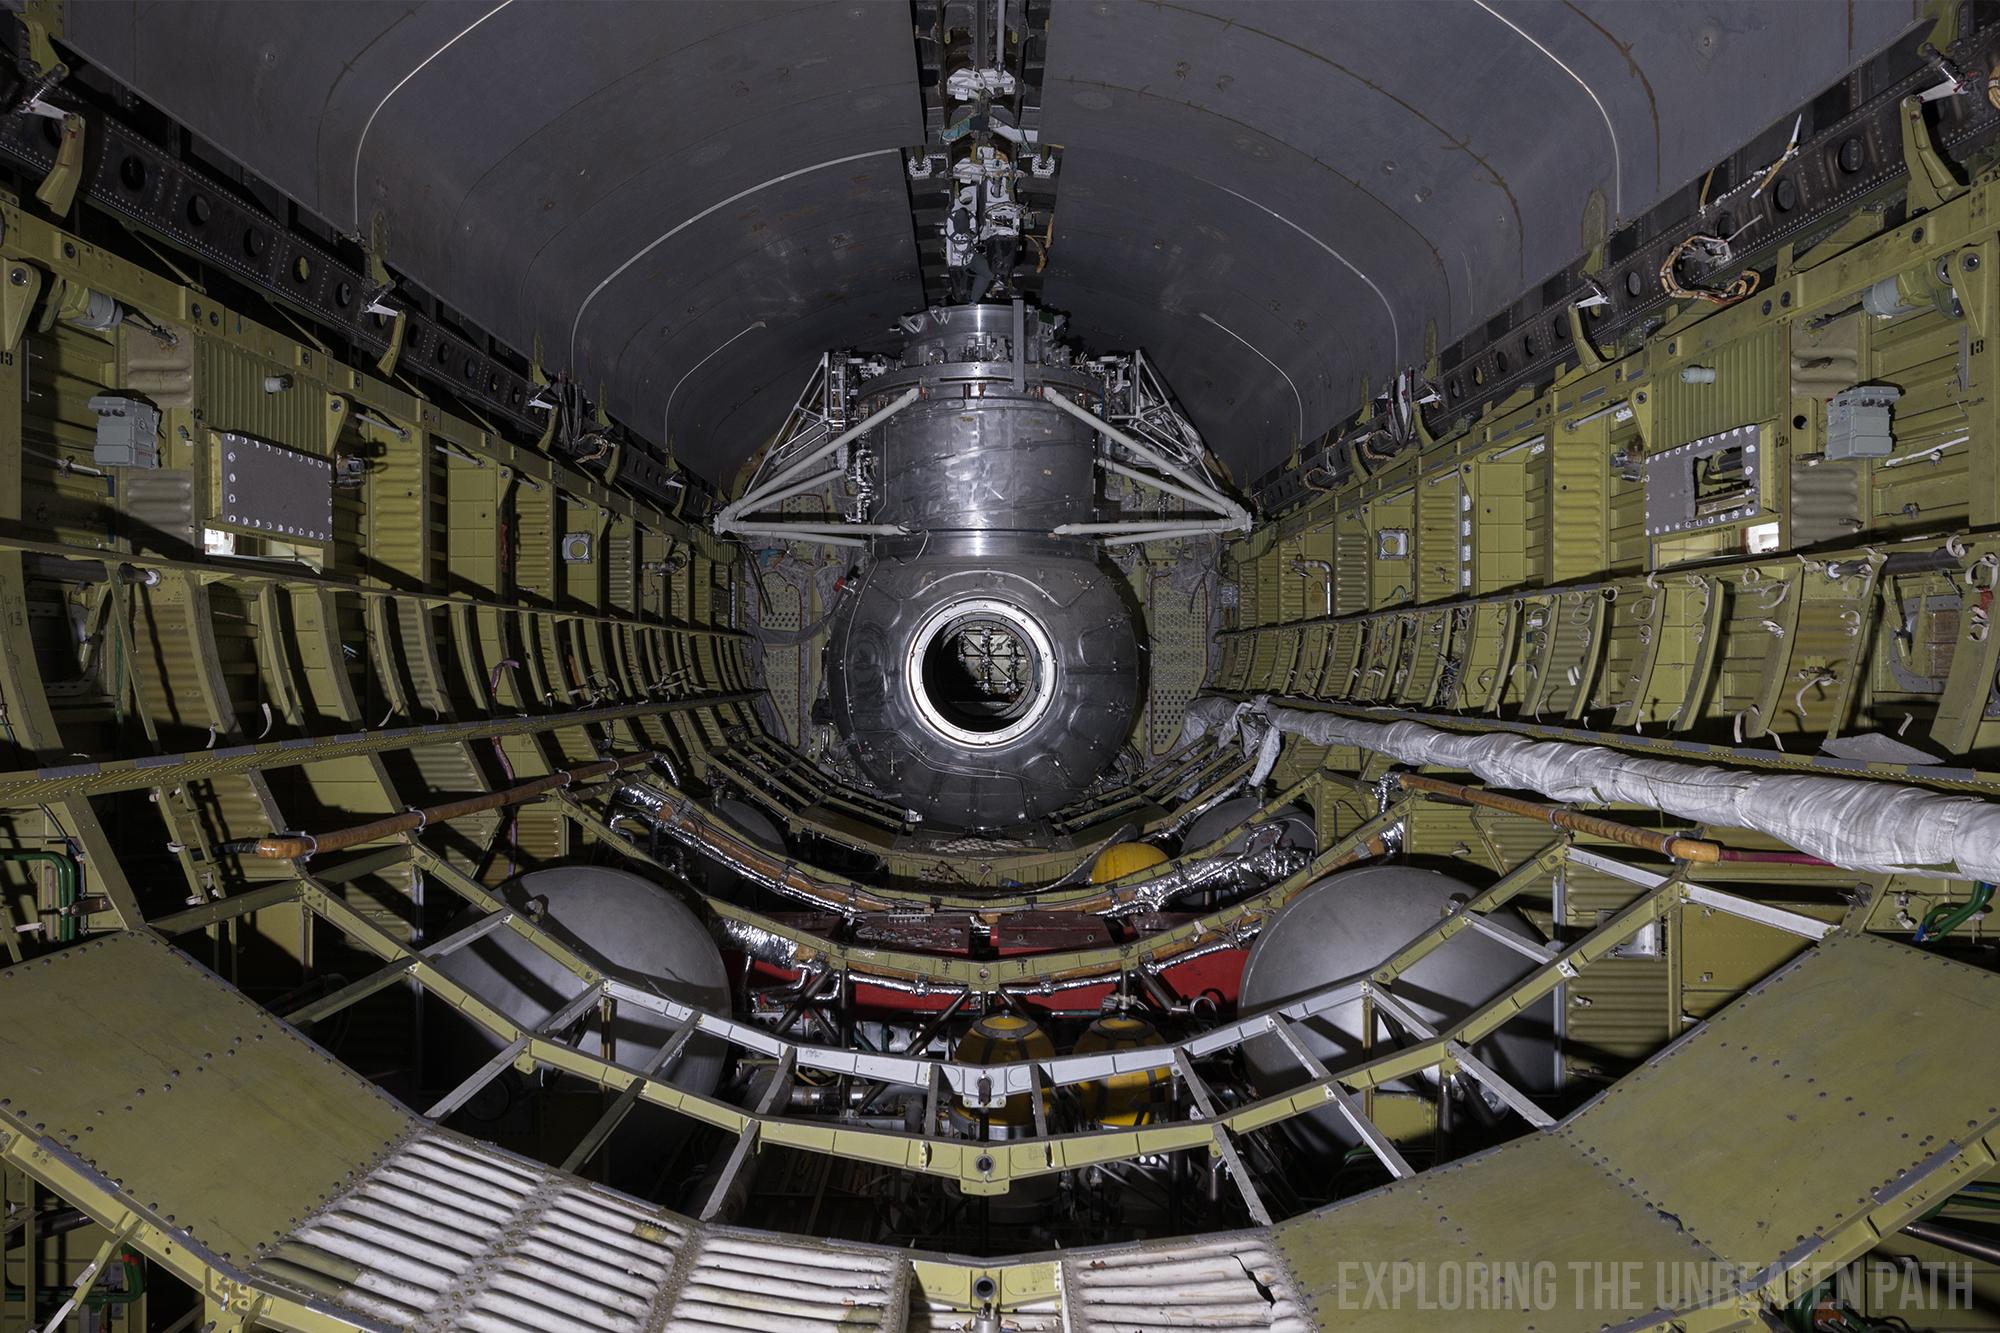 Baikonur Cosmodrome urbex abandoned buran